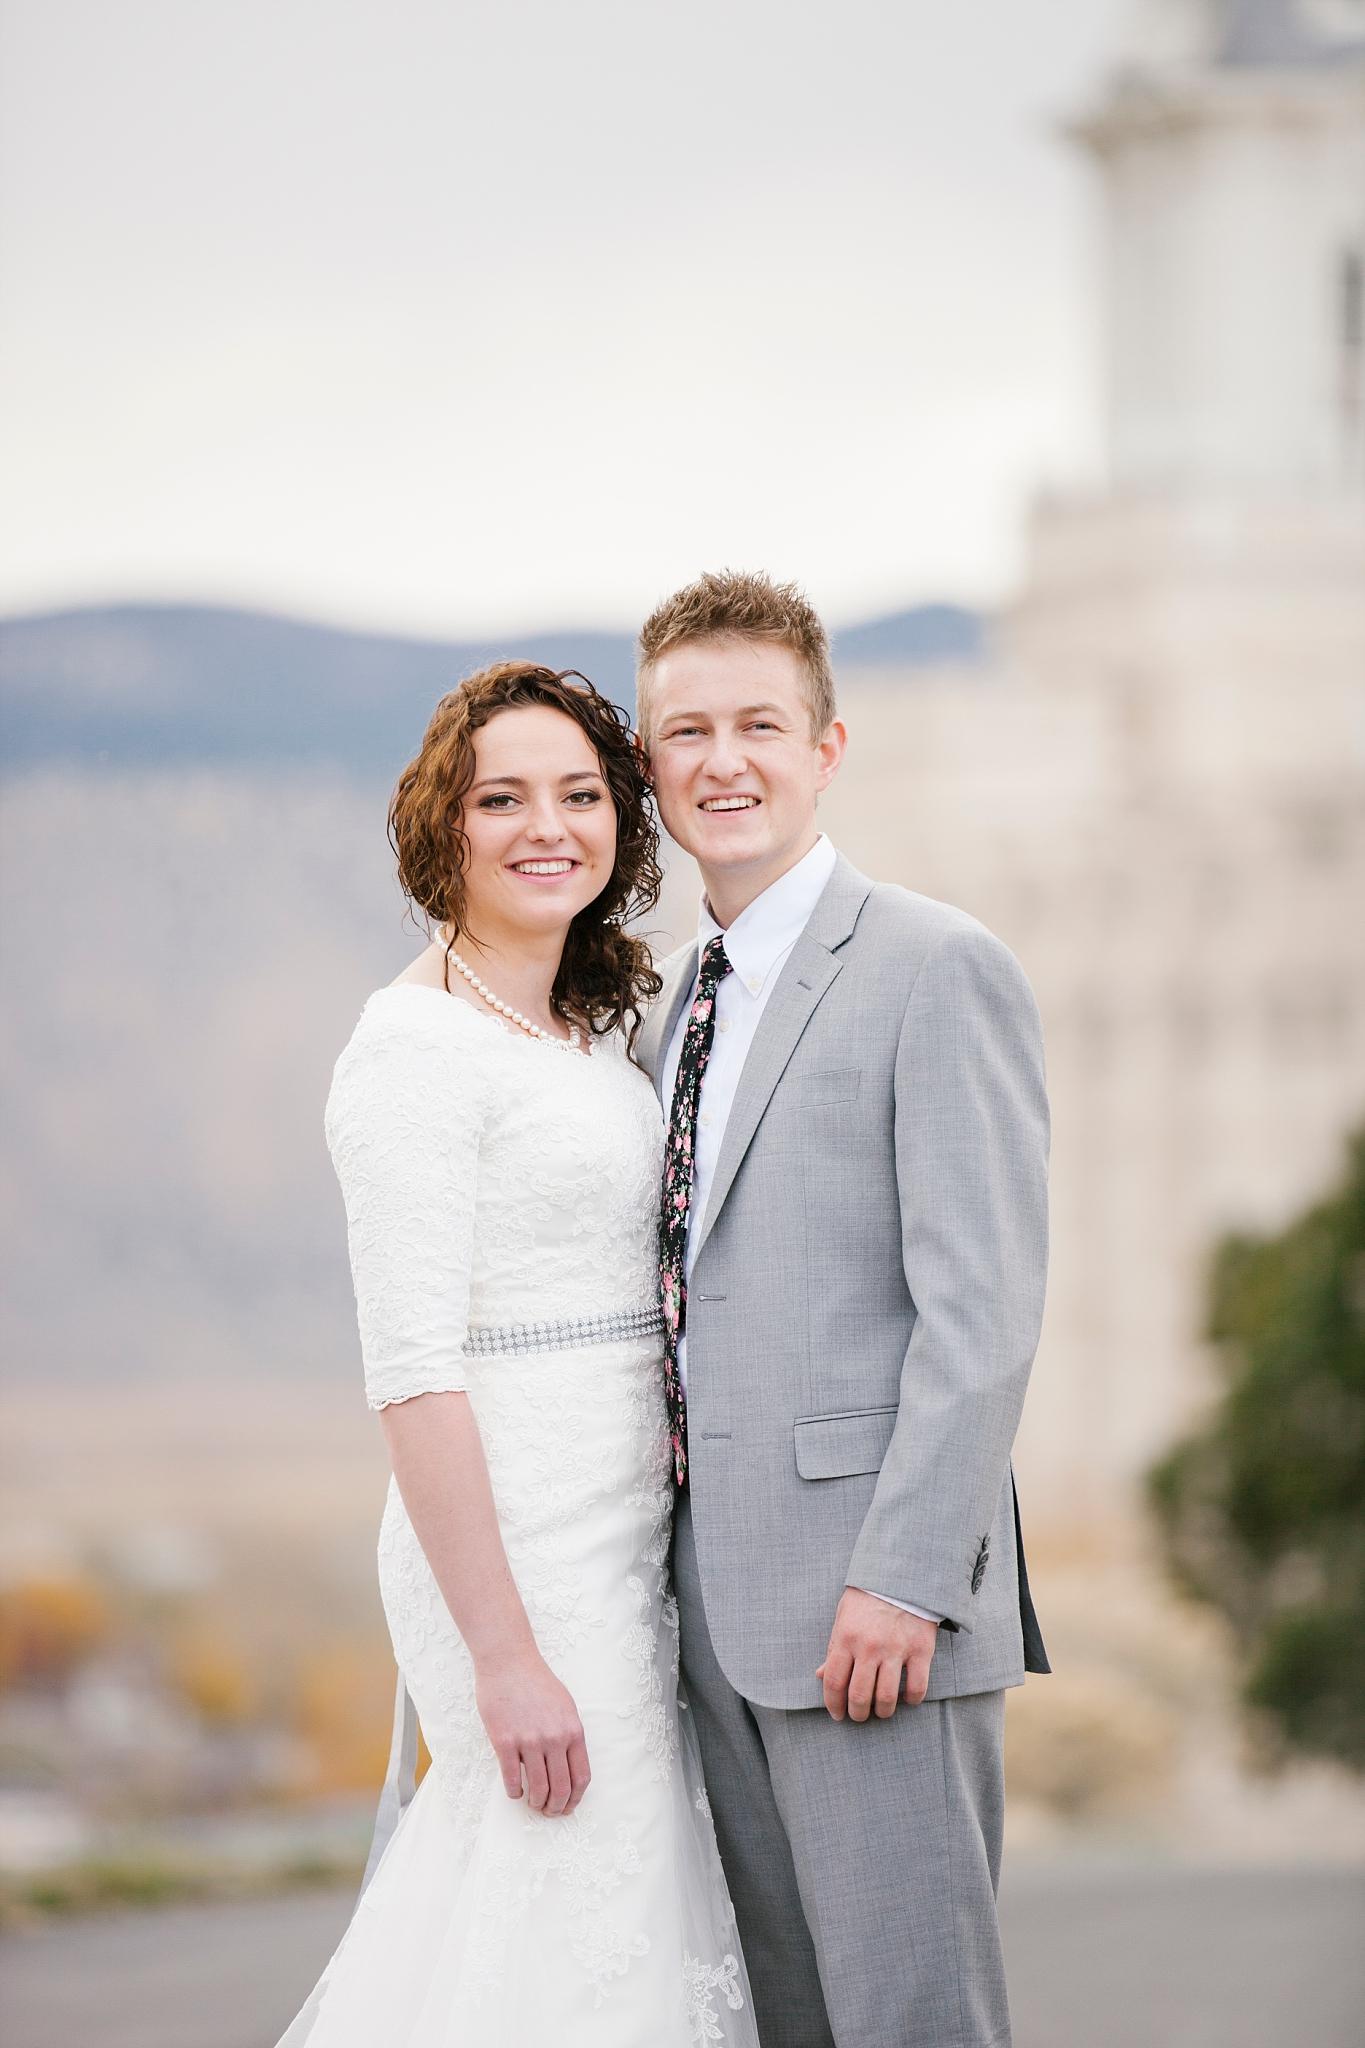 BA-Bridals-118_Lizzie-B-Imagery-Utah-Wedding-Photographer-Engagement-Photography-Salt-Lake-City-Park-City-Utah-County-Manti-Utah-Temple.jpg